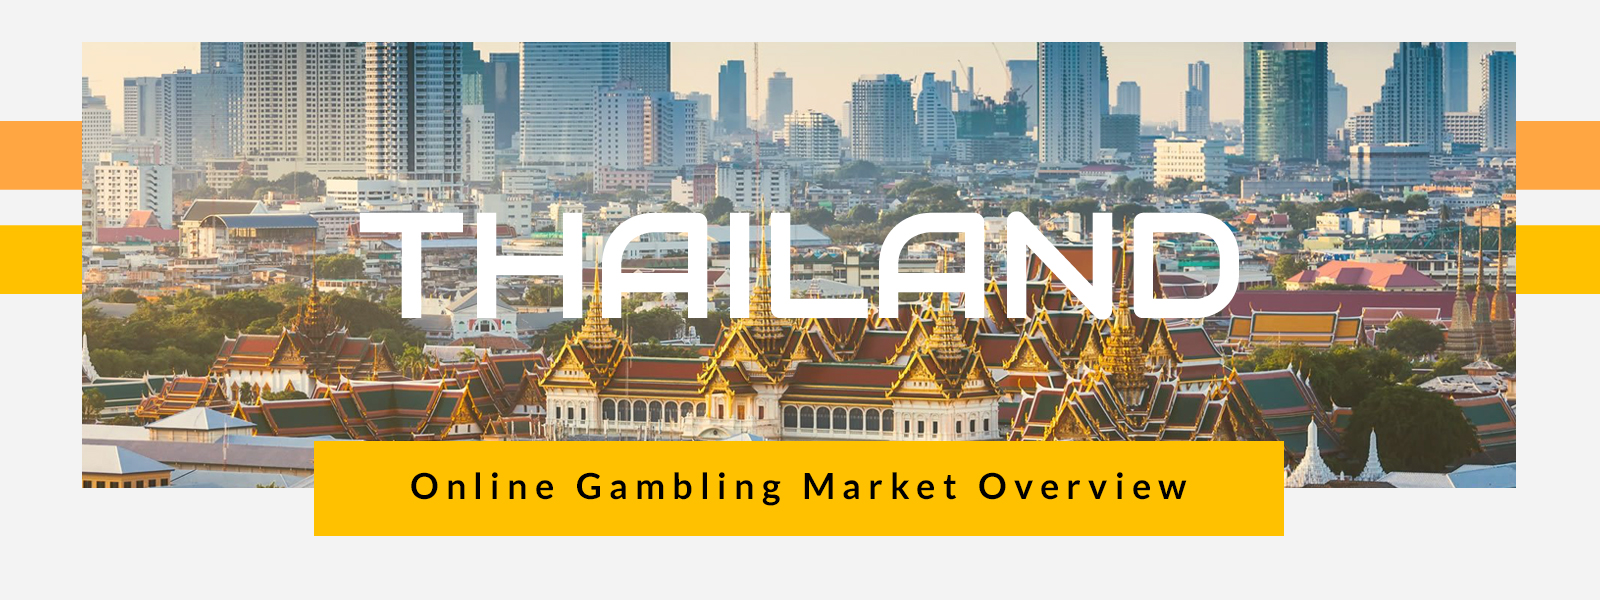 Thailand Online Gambling Market Featured Image